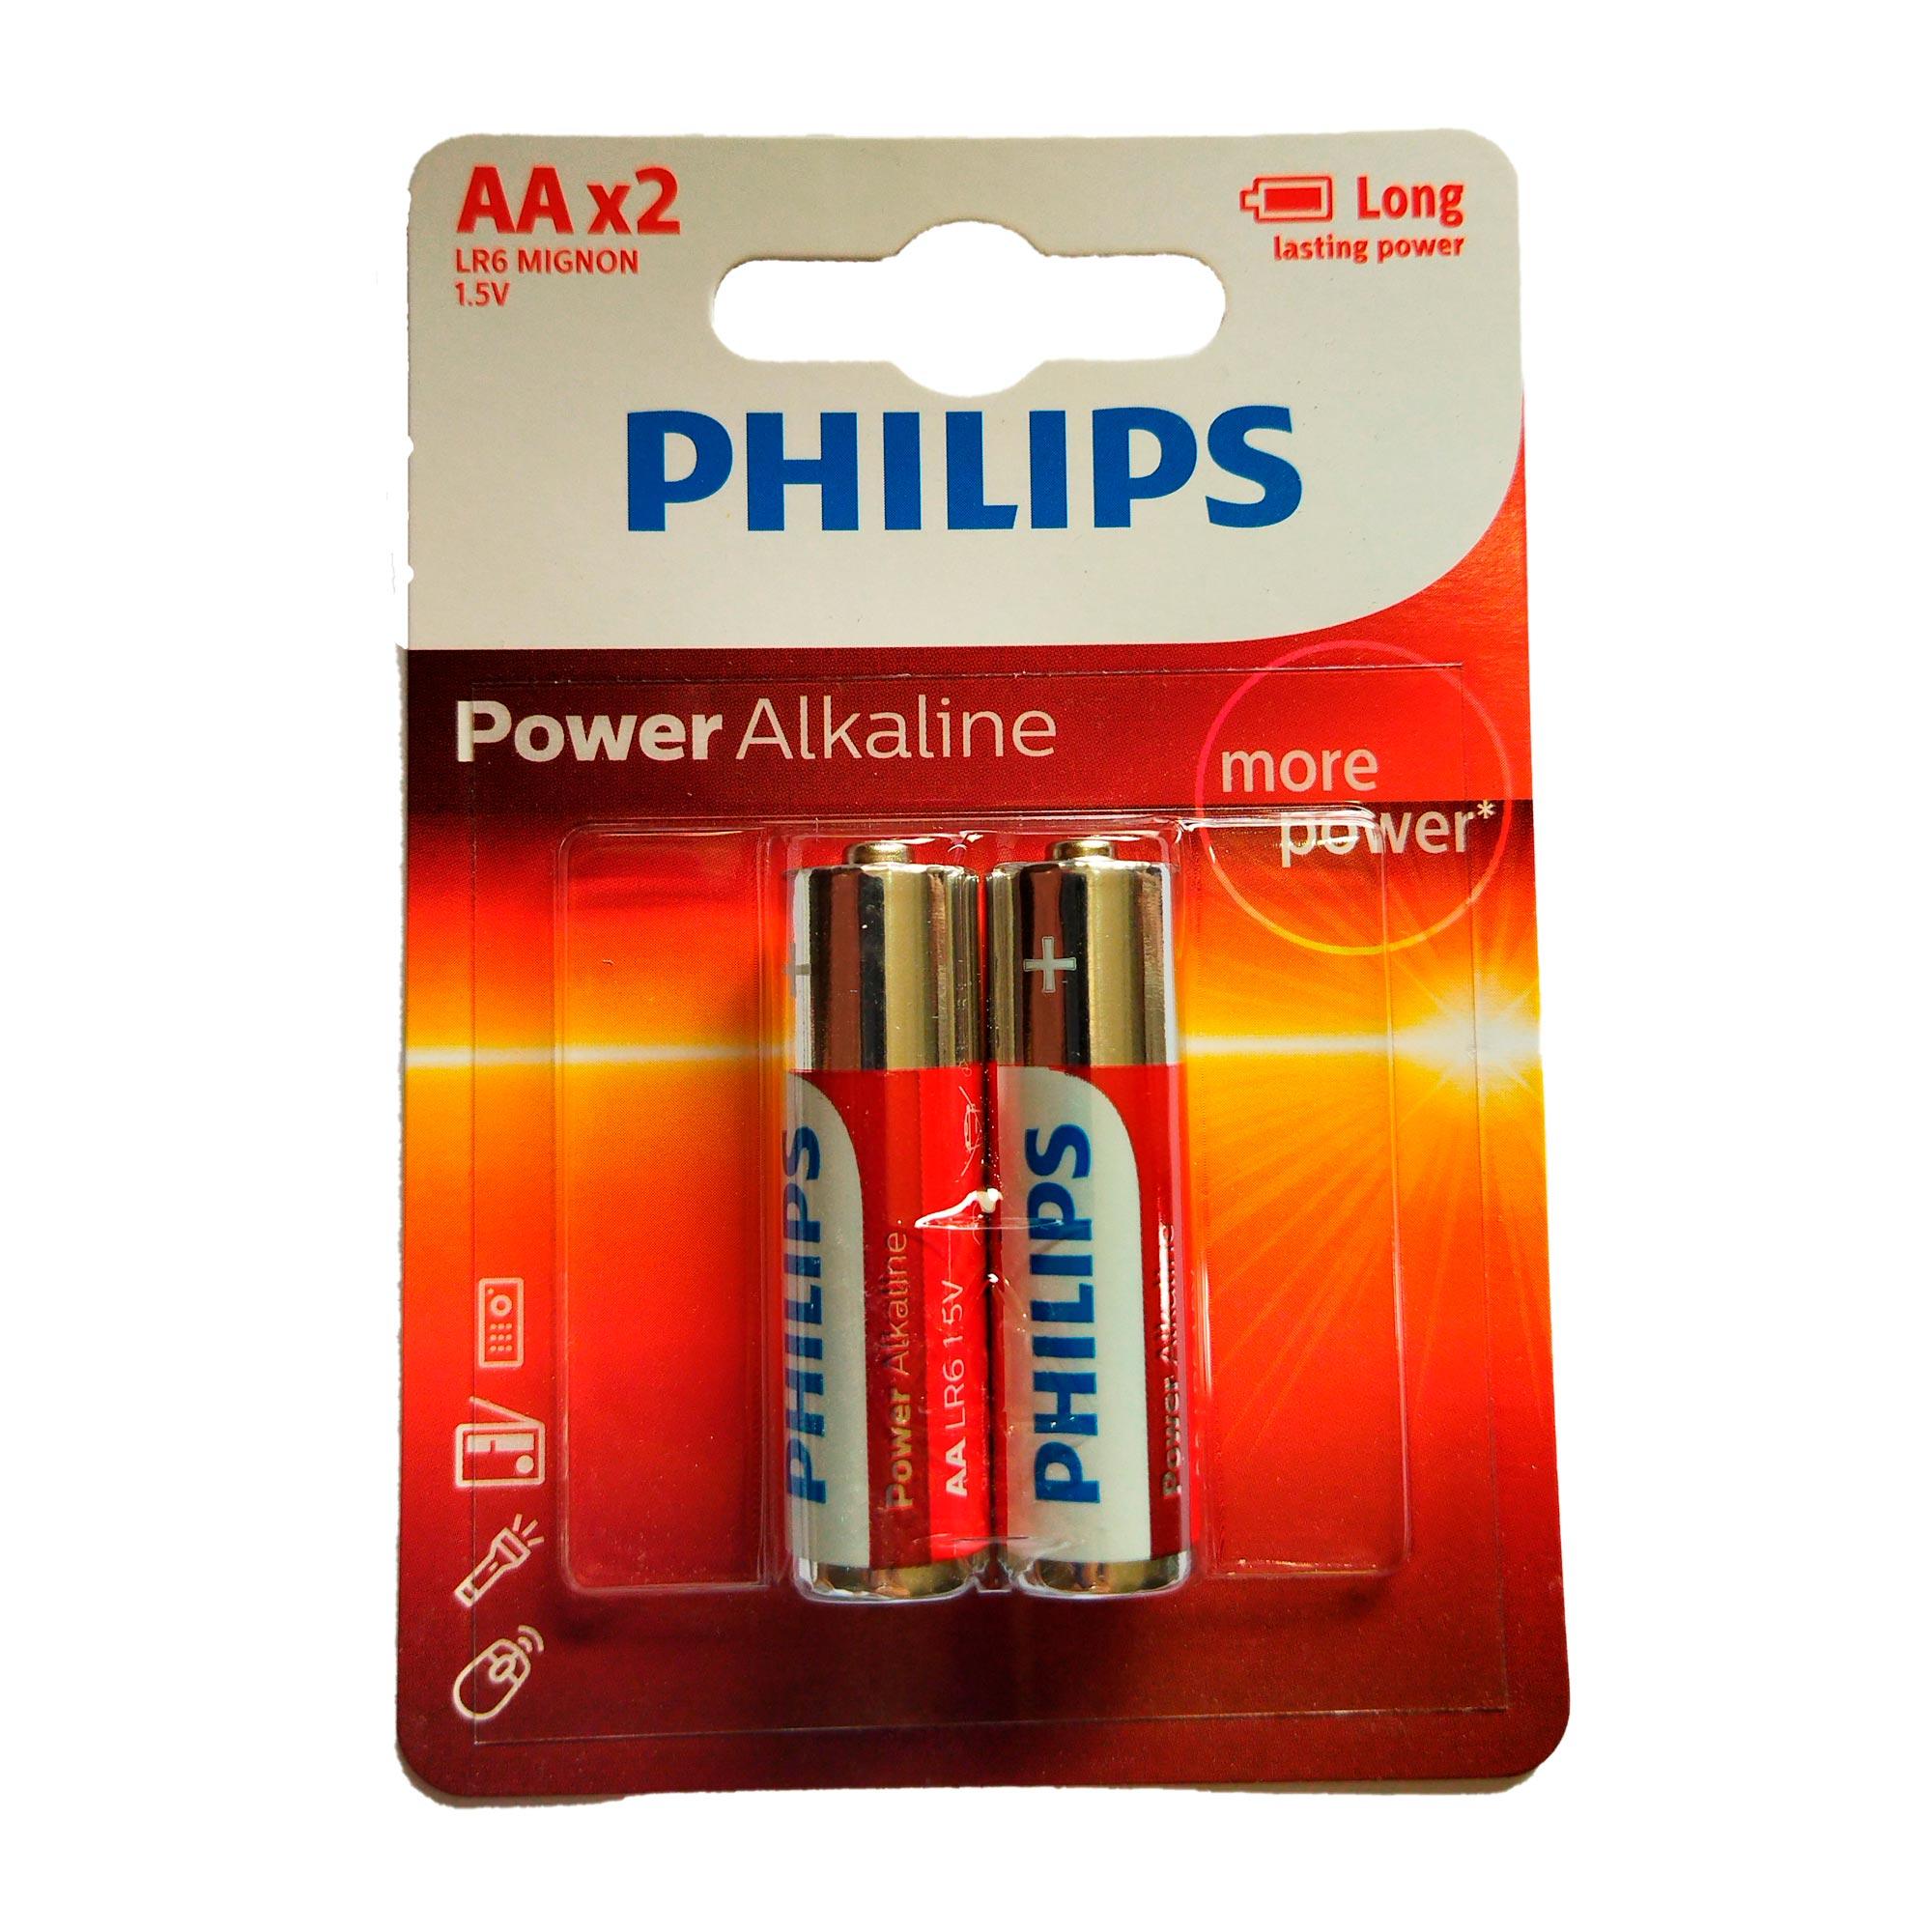 2 Pilhas Alcalina Philips AA Pequena 1,5v LR6P2B/97